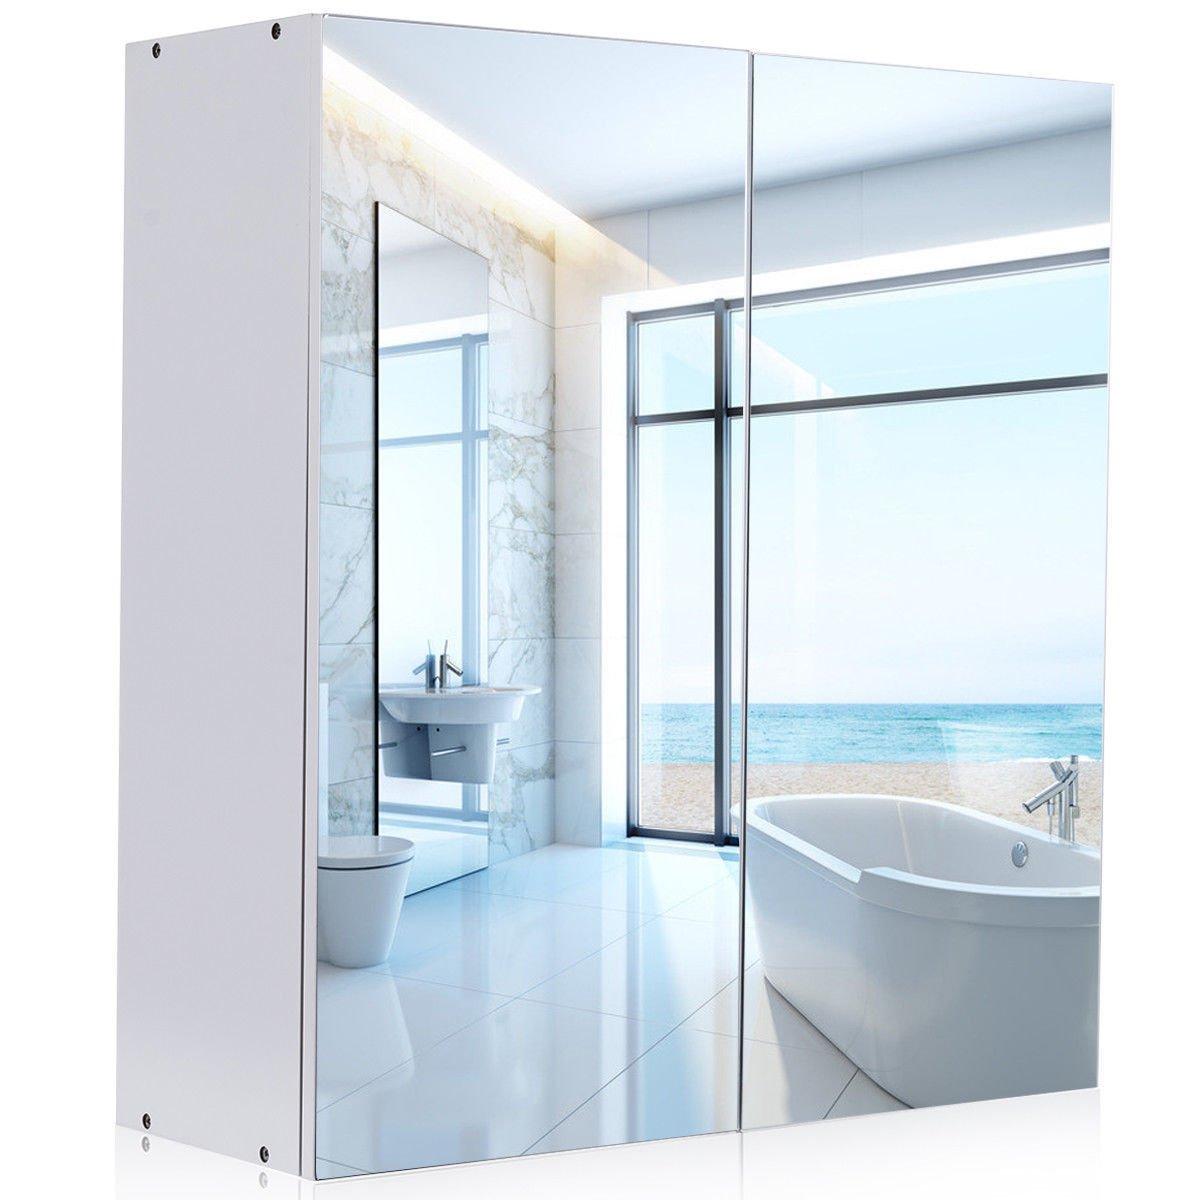 New 24'' Wide Wall Mounted Mirrored Bathroom Medicine Storage Cabinet 2 Mirror Door